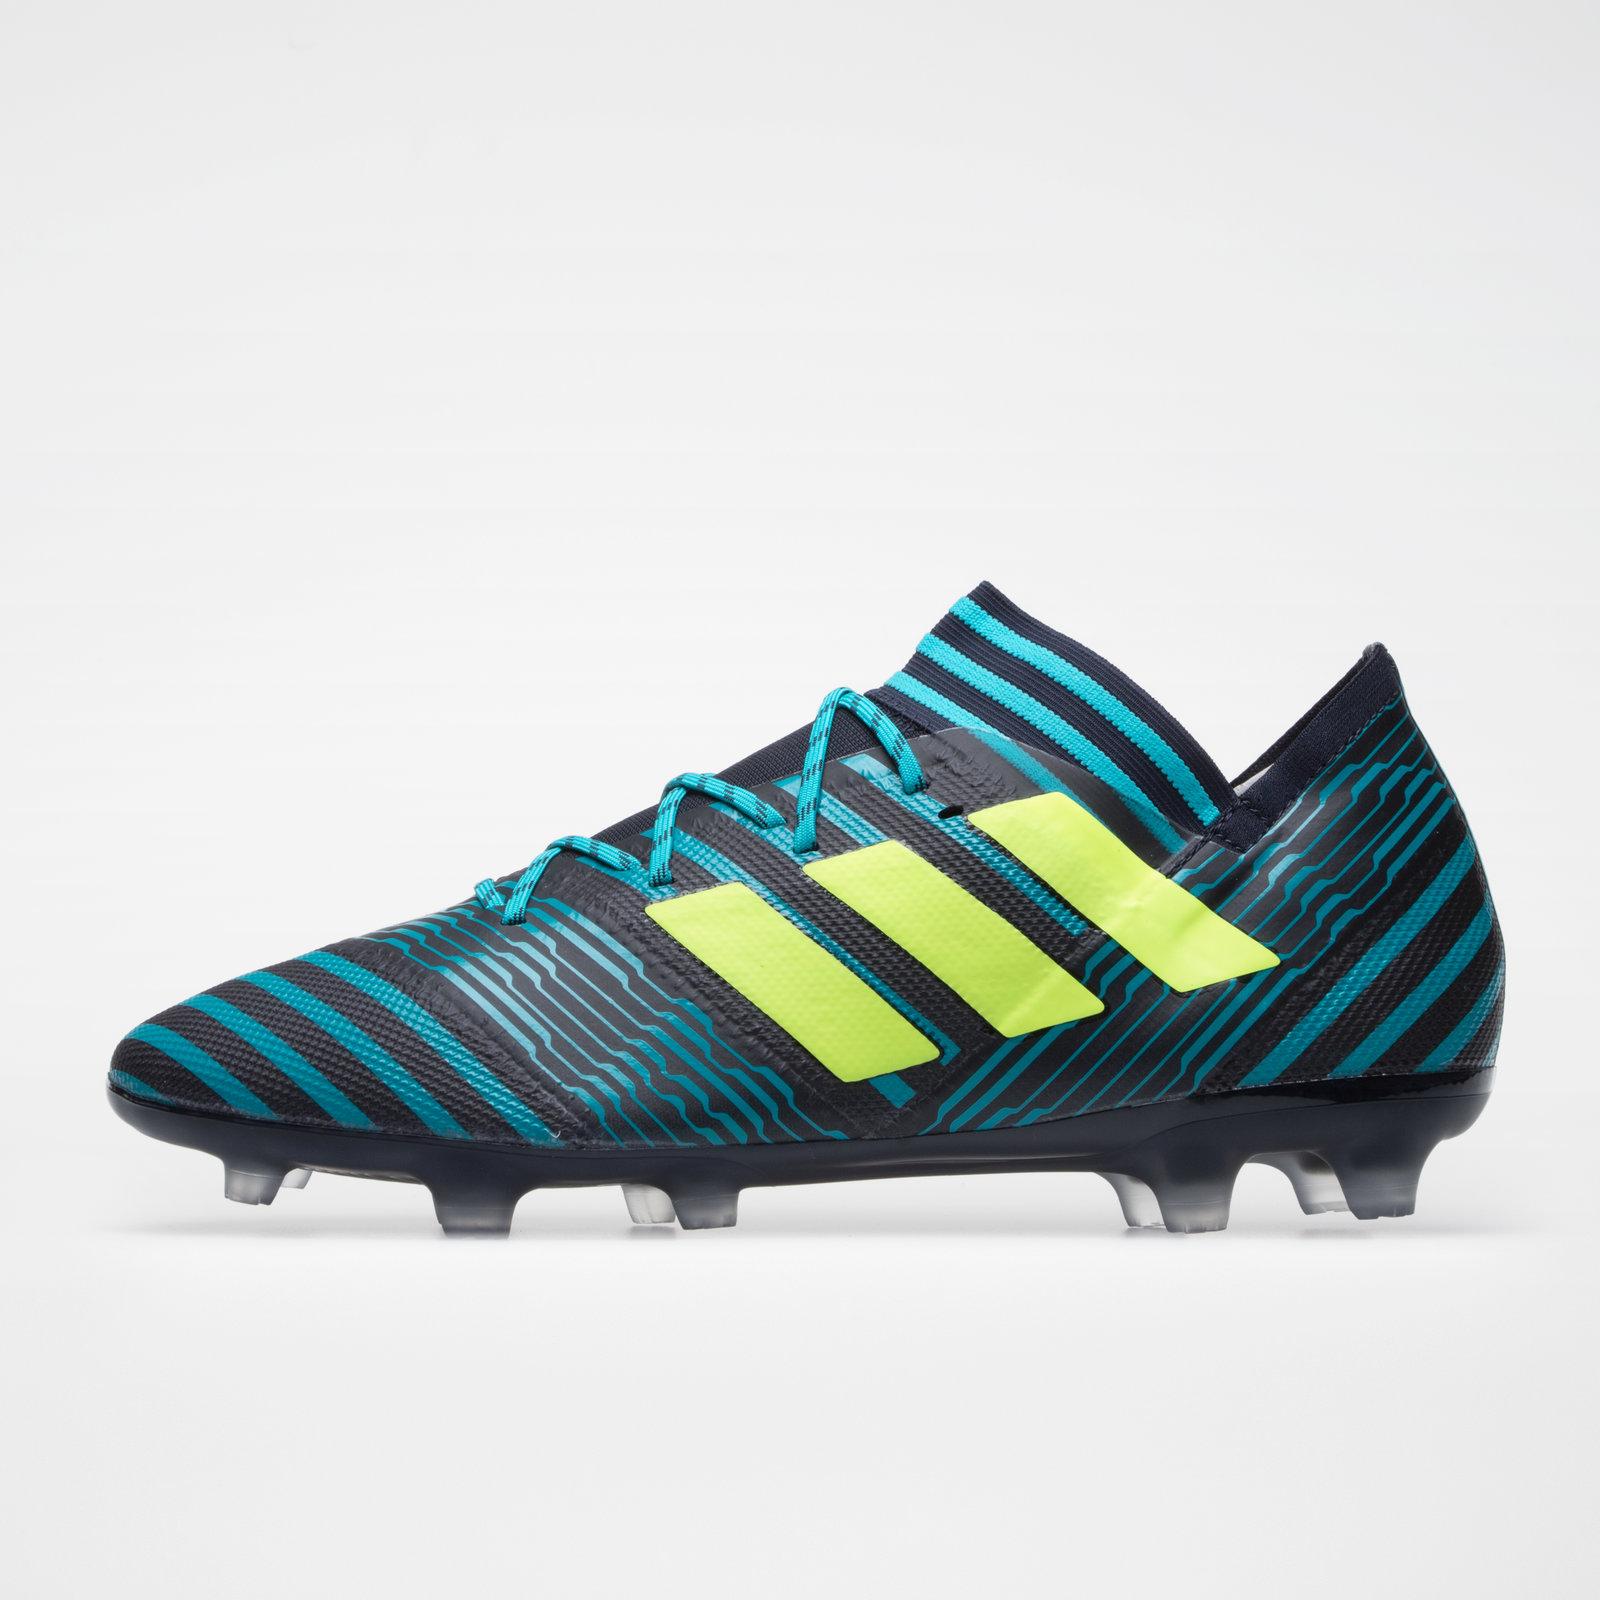 Image of Nemeziz 17.2 FG Football Boots